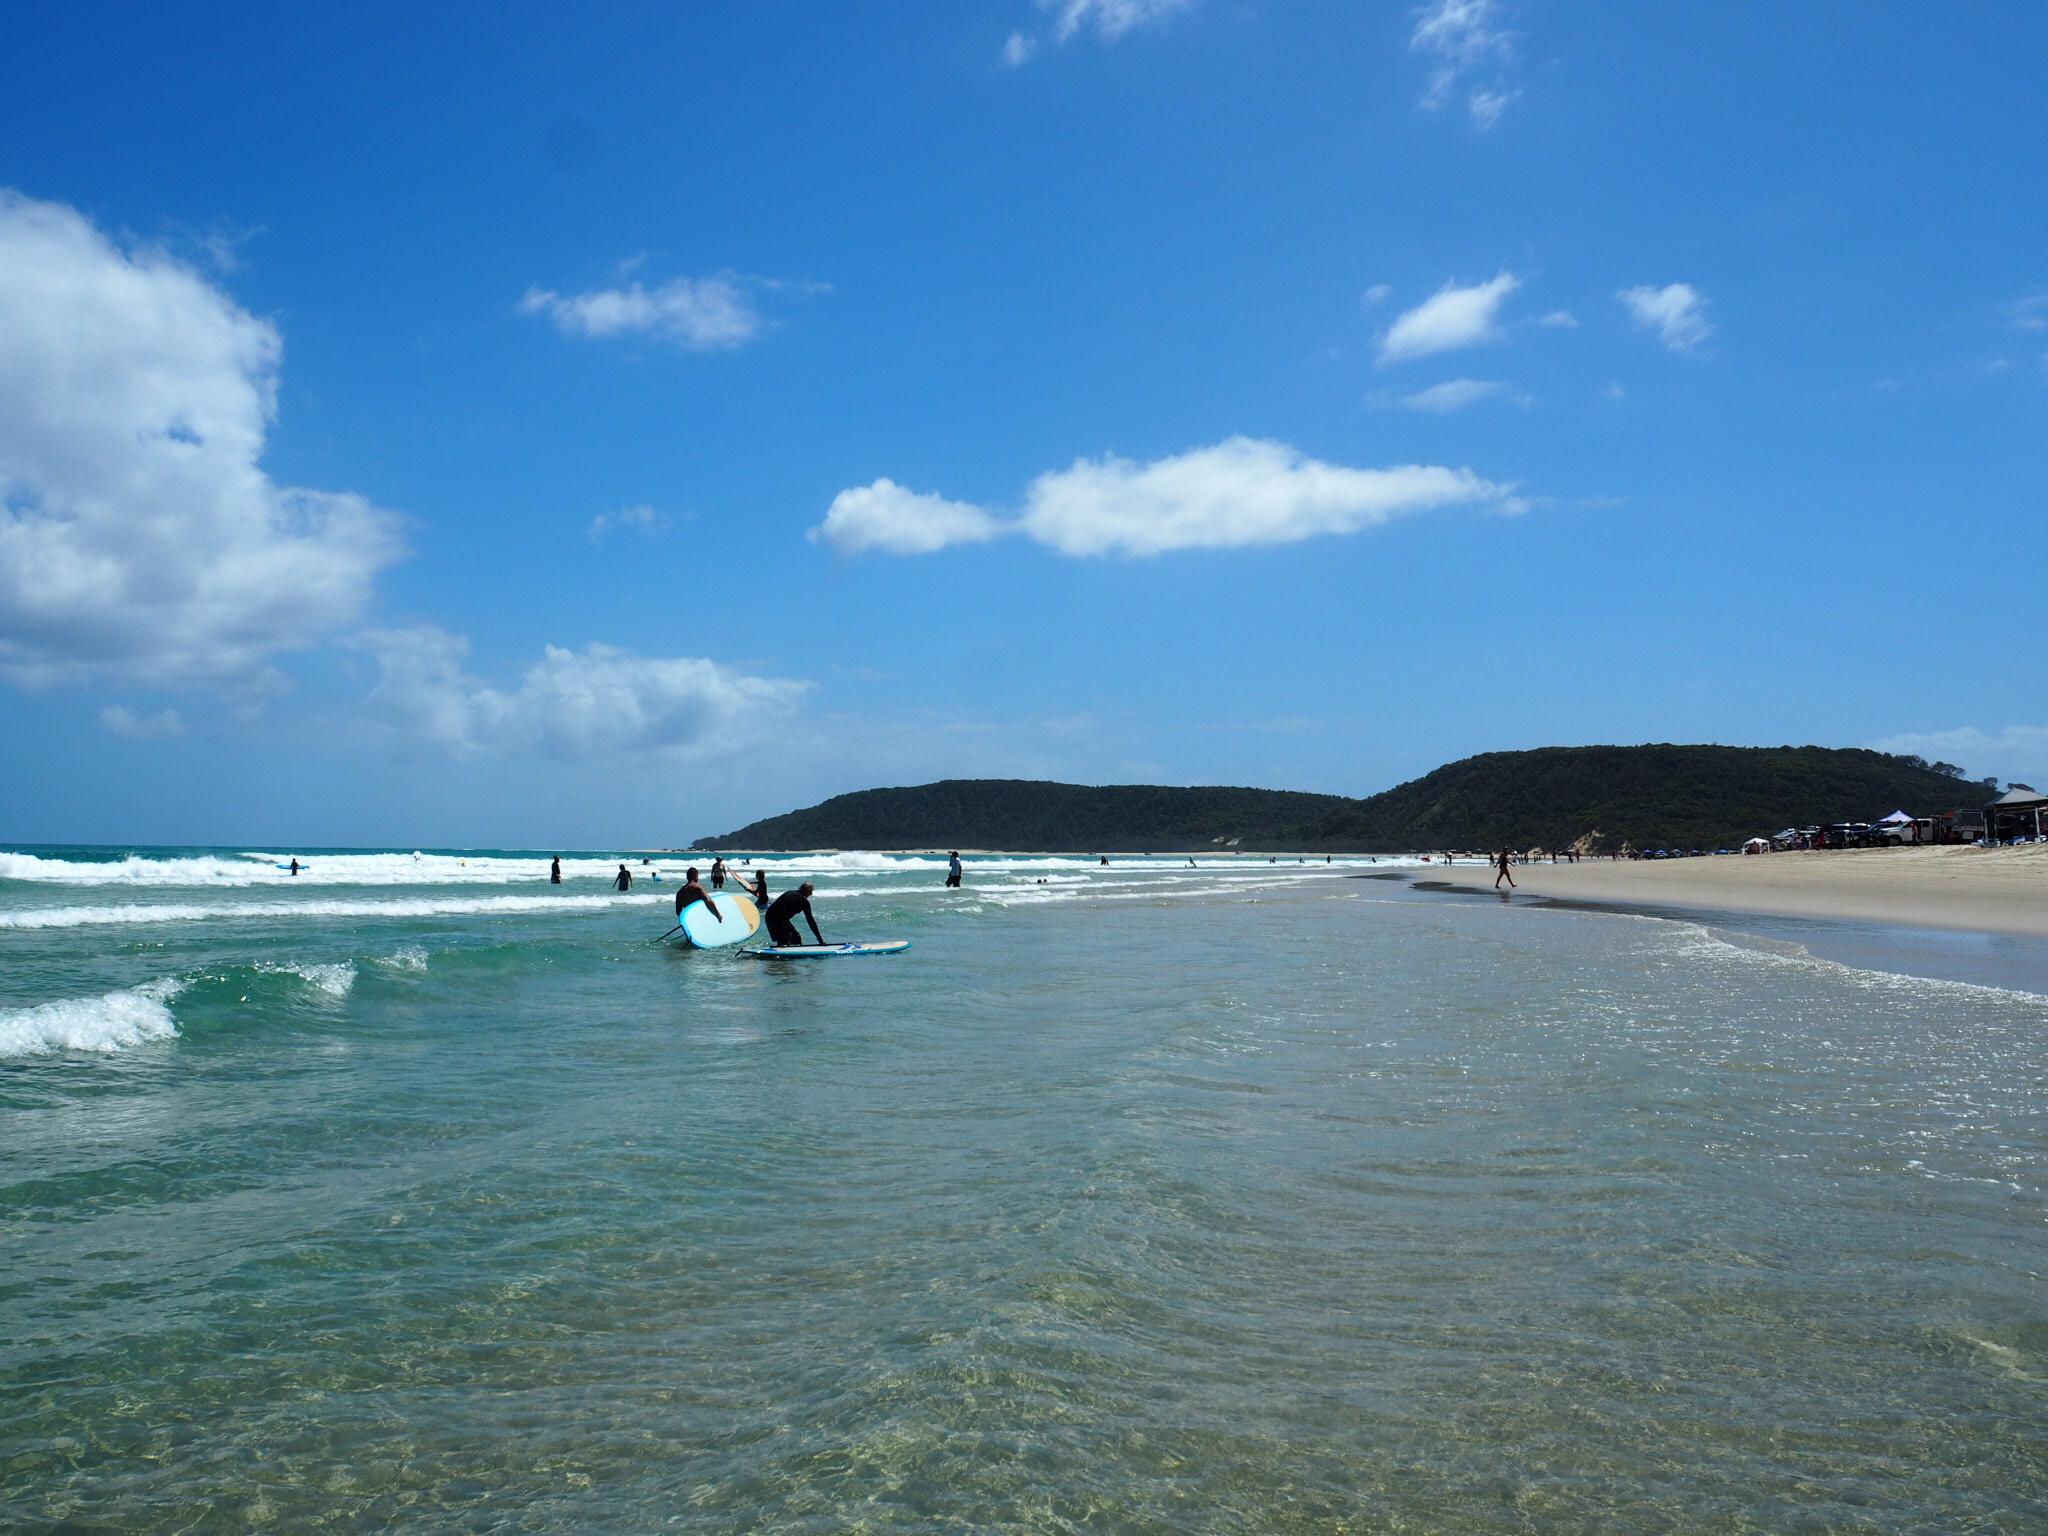 Location: Double Island Point, Queensland AUSTRALIA